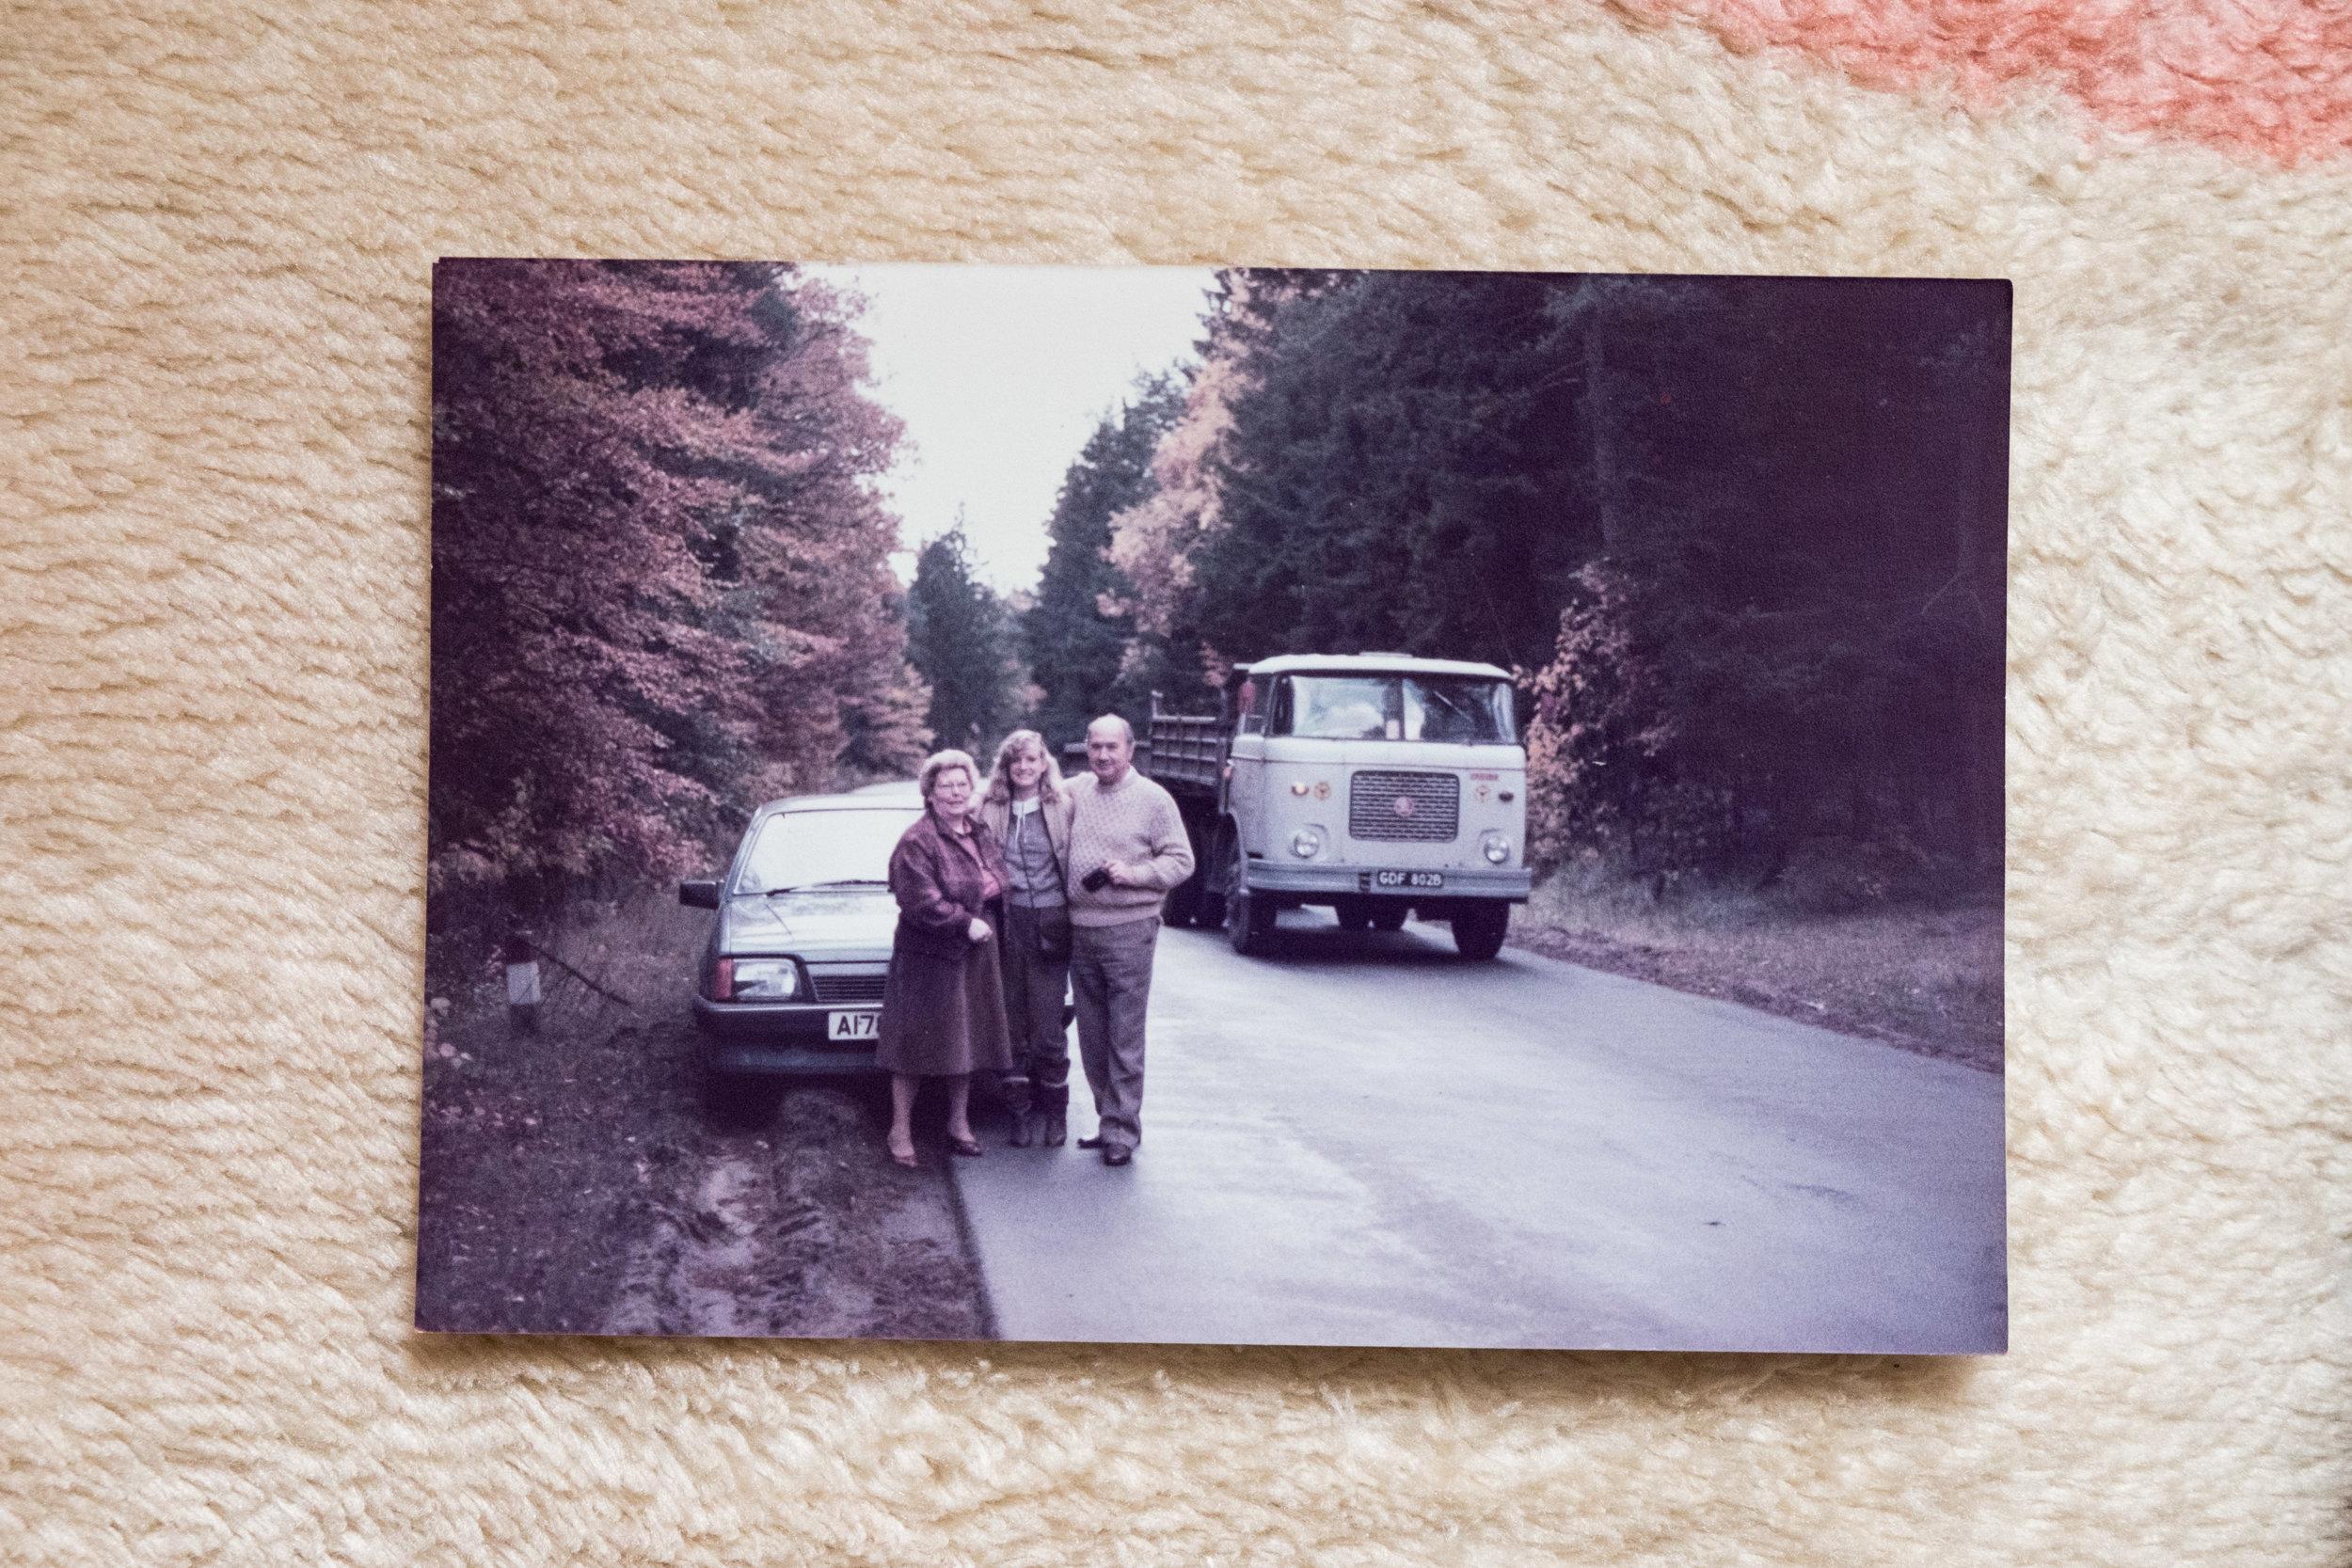 Mum, Nana and Dziadek on their way to the farm (Dad was taking the photo).